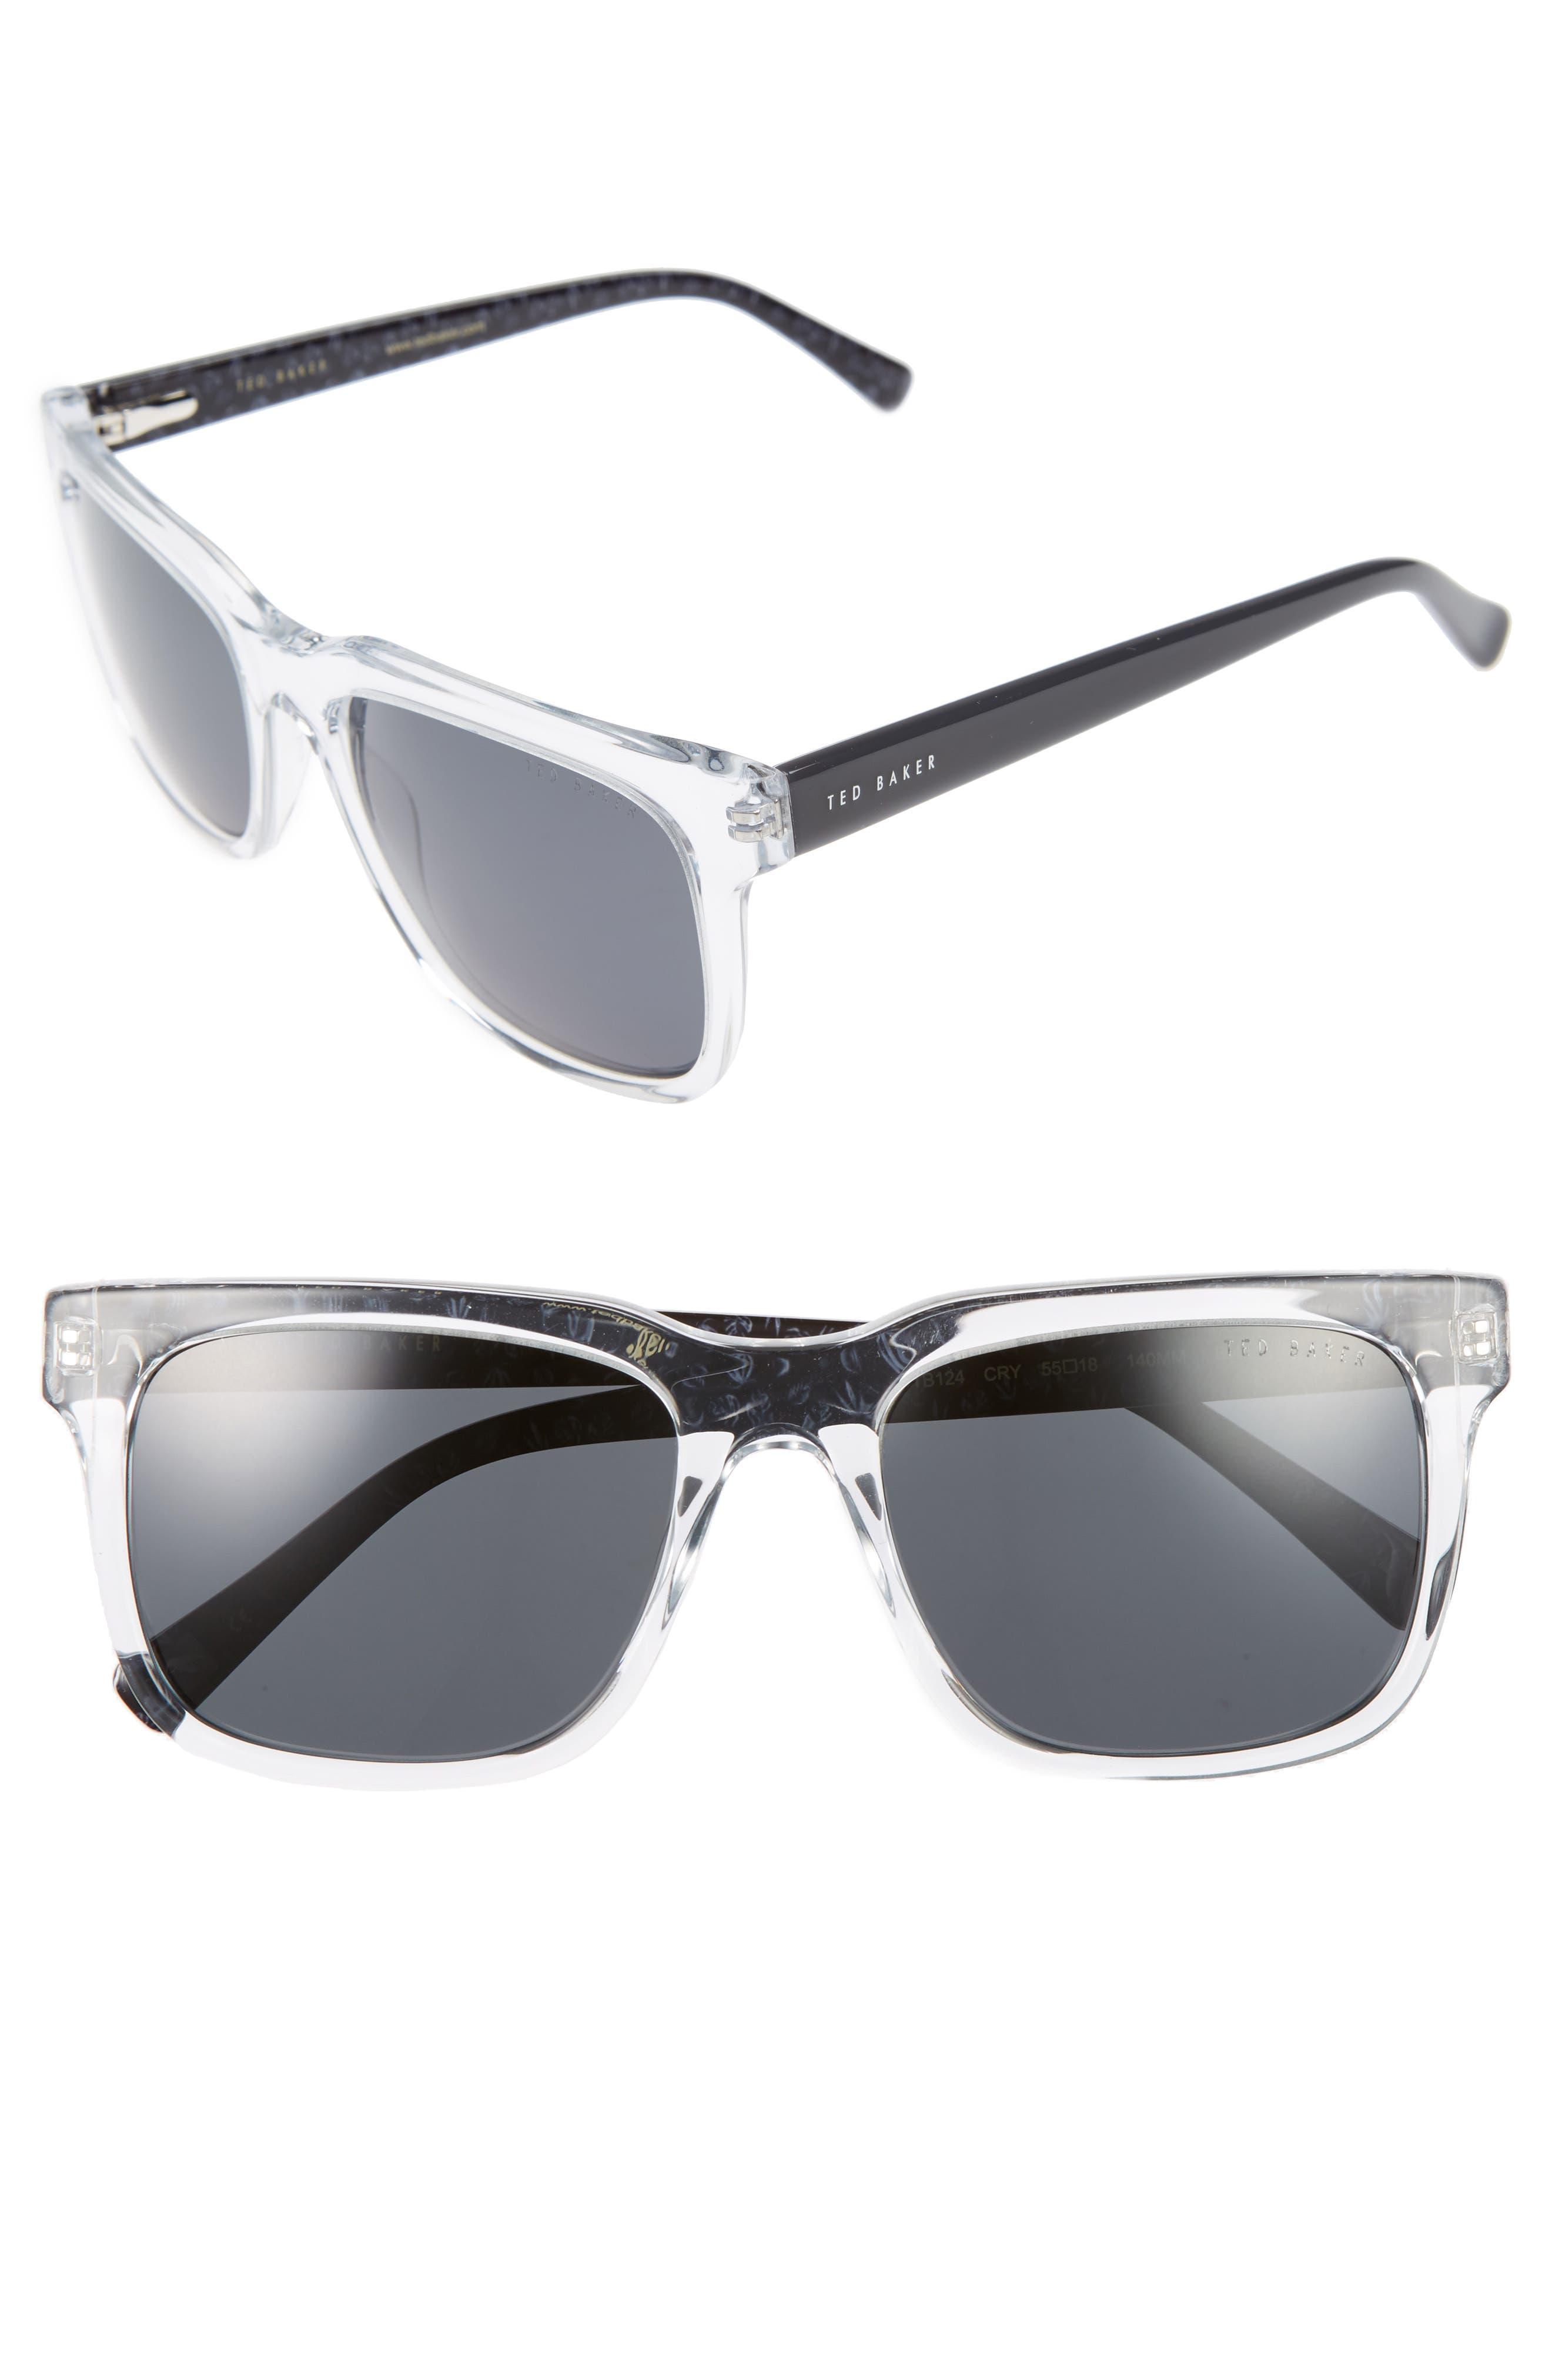 55mm Polarized Sunglasses,                         Main,                         color, 141